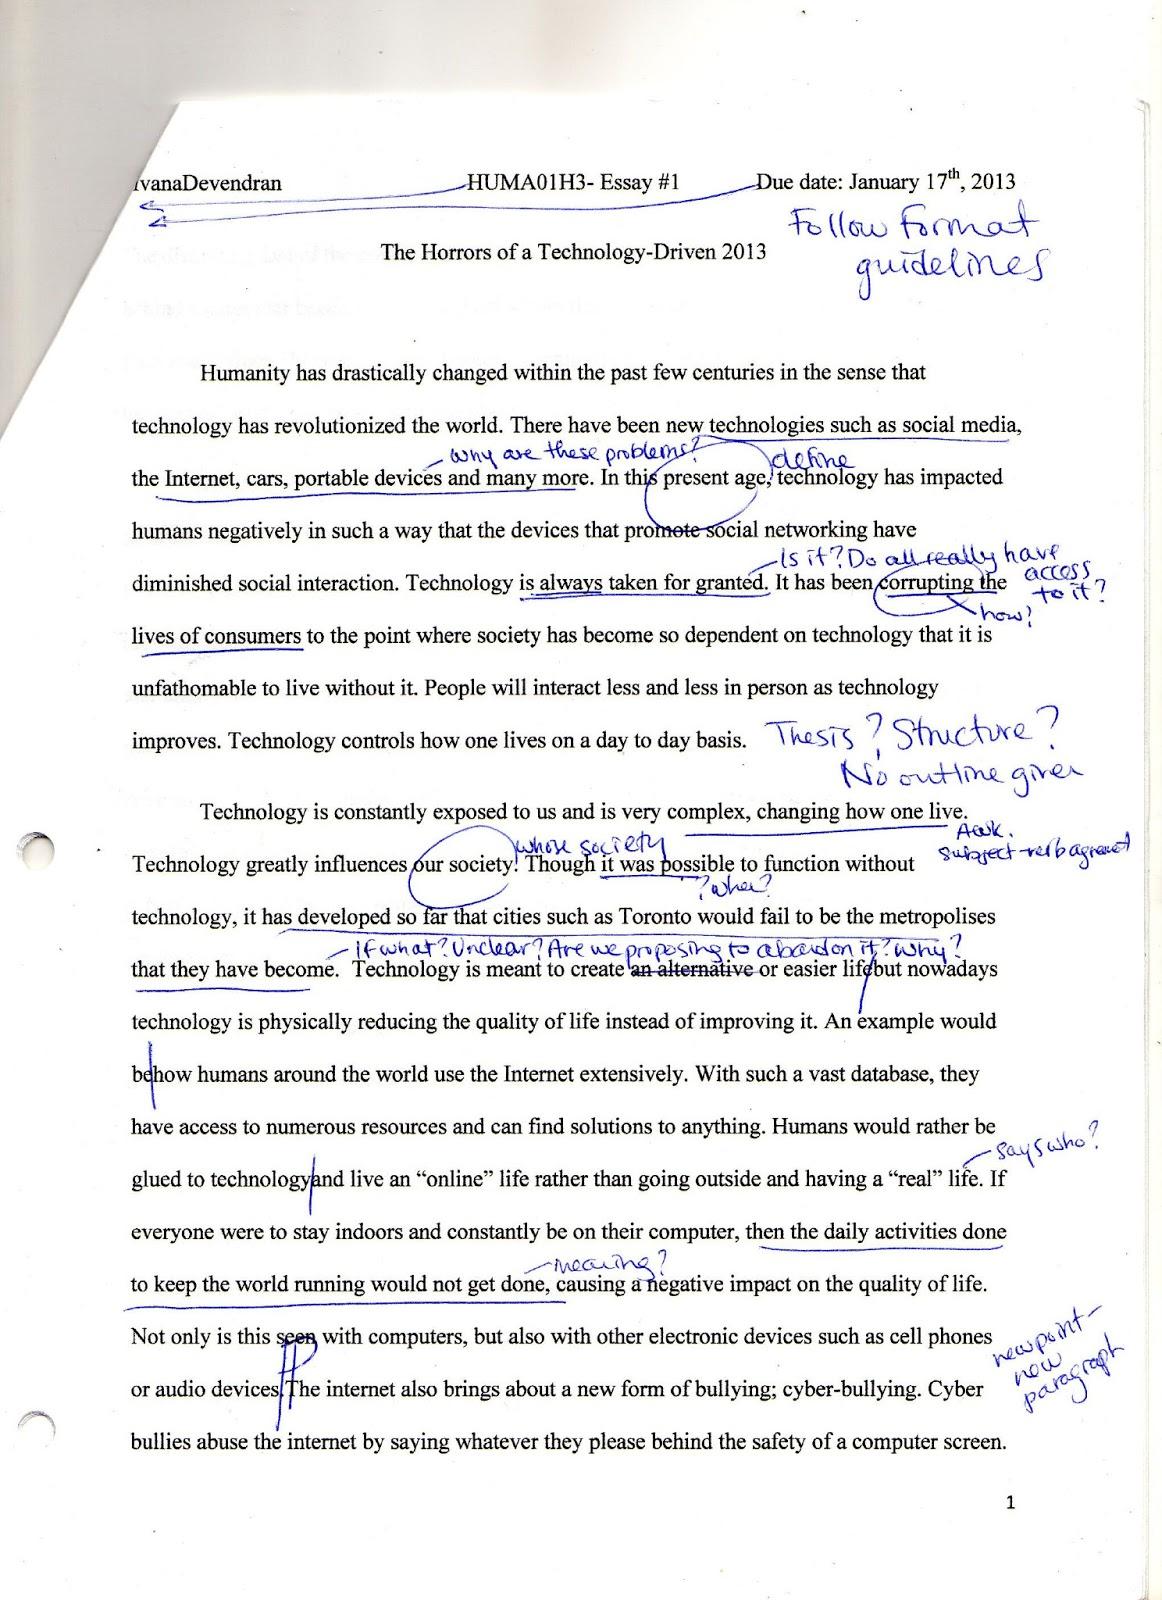 006 Cyber Bullying Argumentative Essay Topics Free Professional Resume I Writing Cyberbullying Example Impressive Essays Full